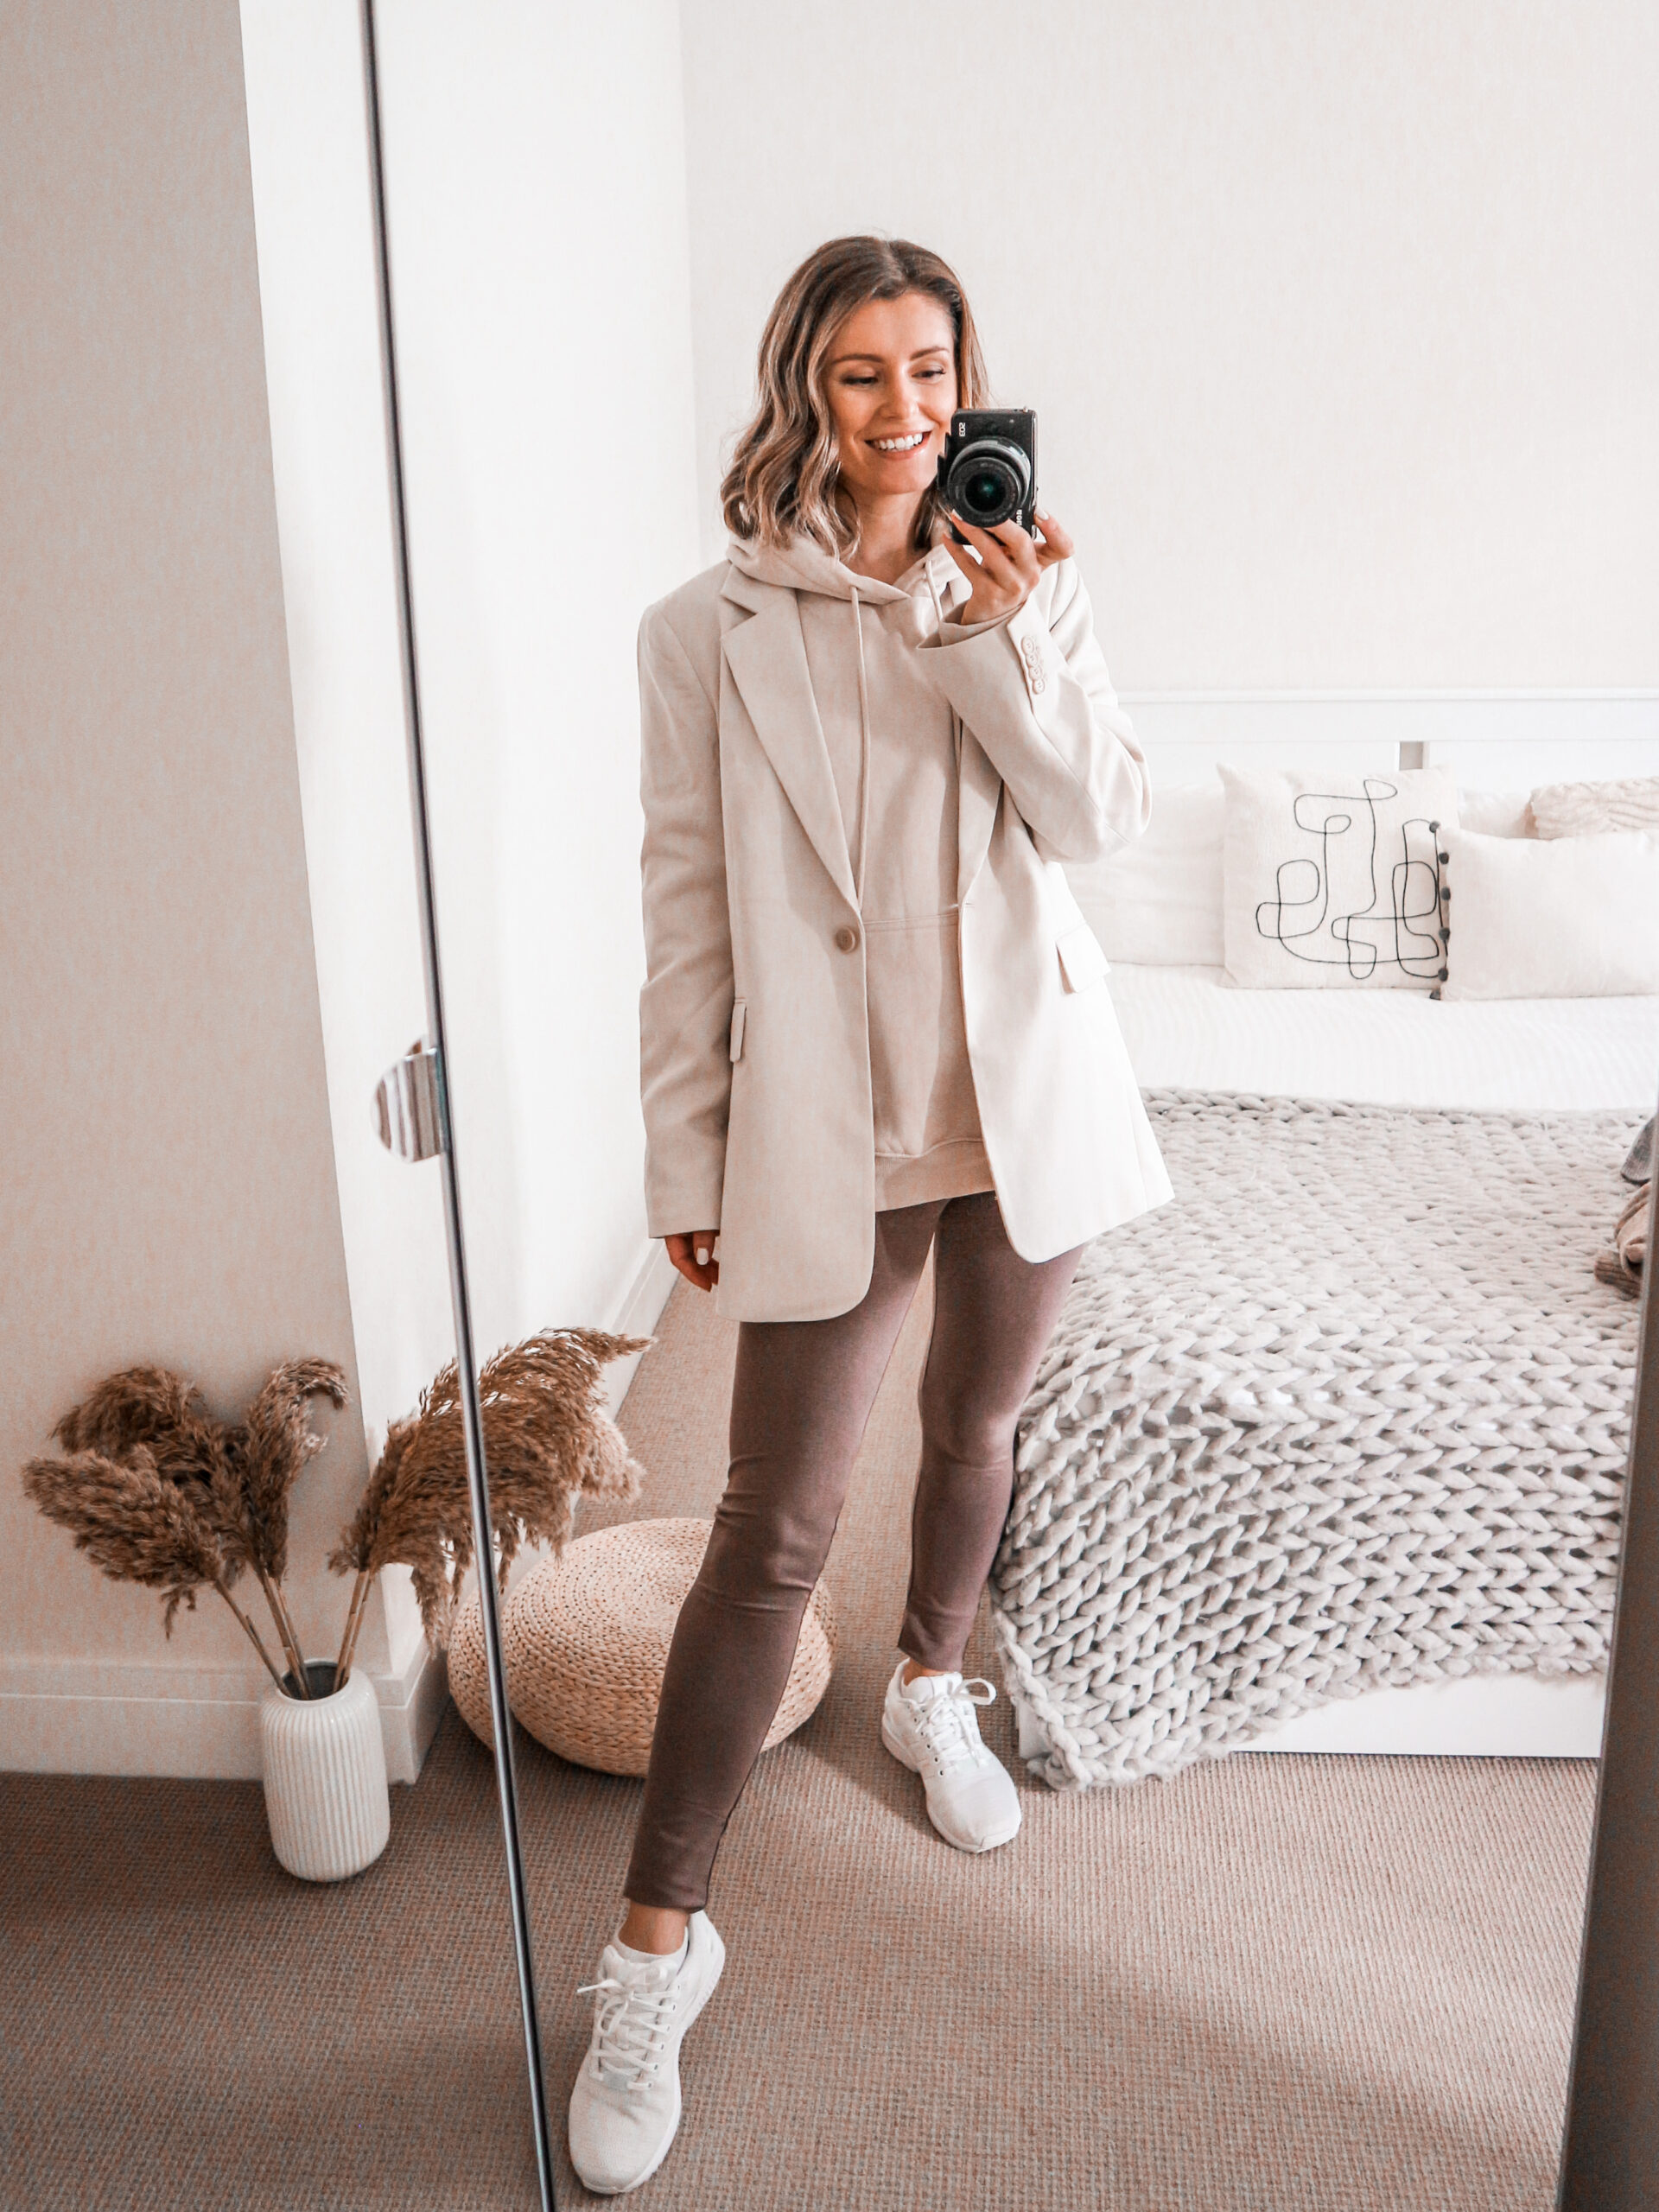 H&M Fall Haul New in Autumn Winter Capsule Wardrobe 2021